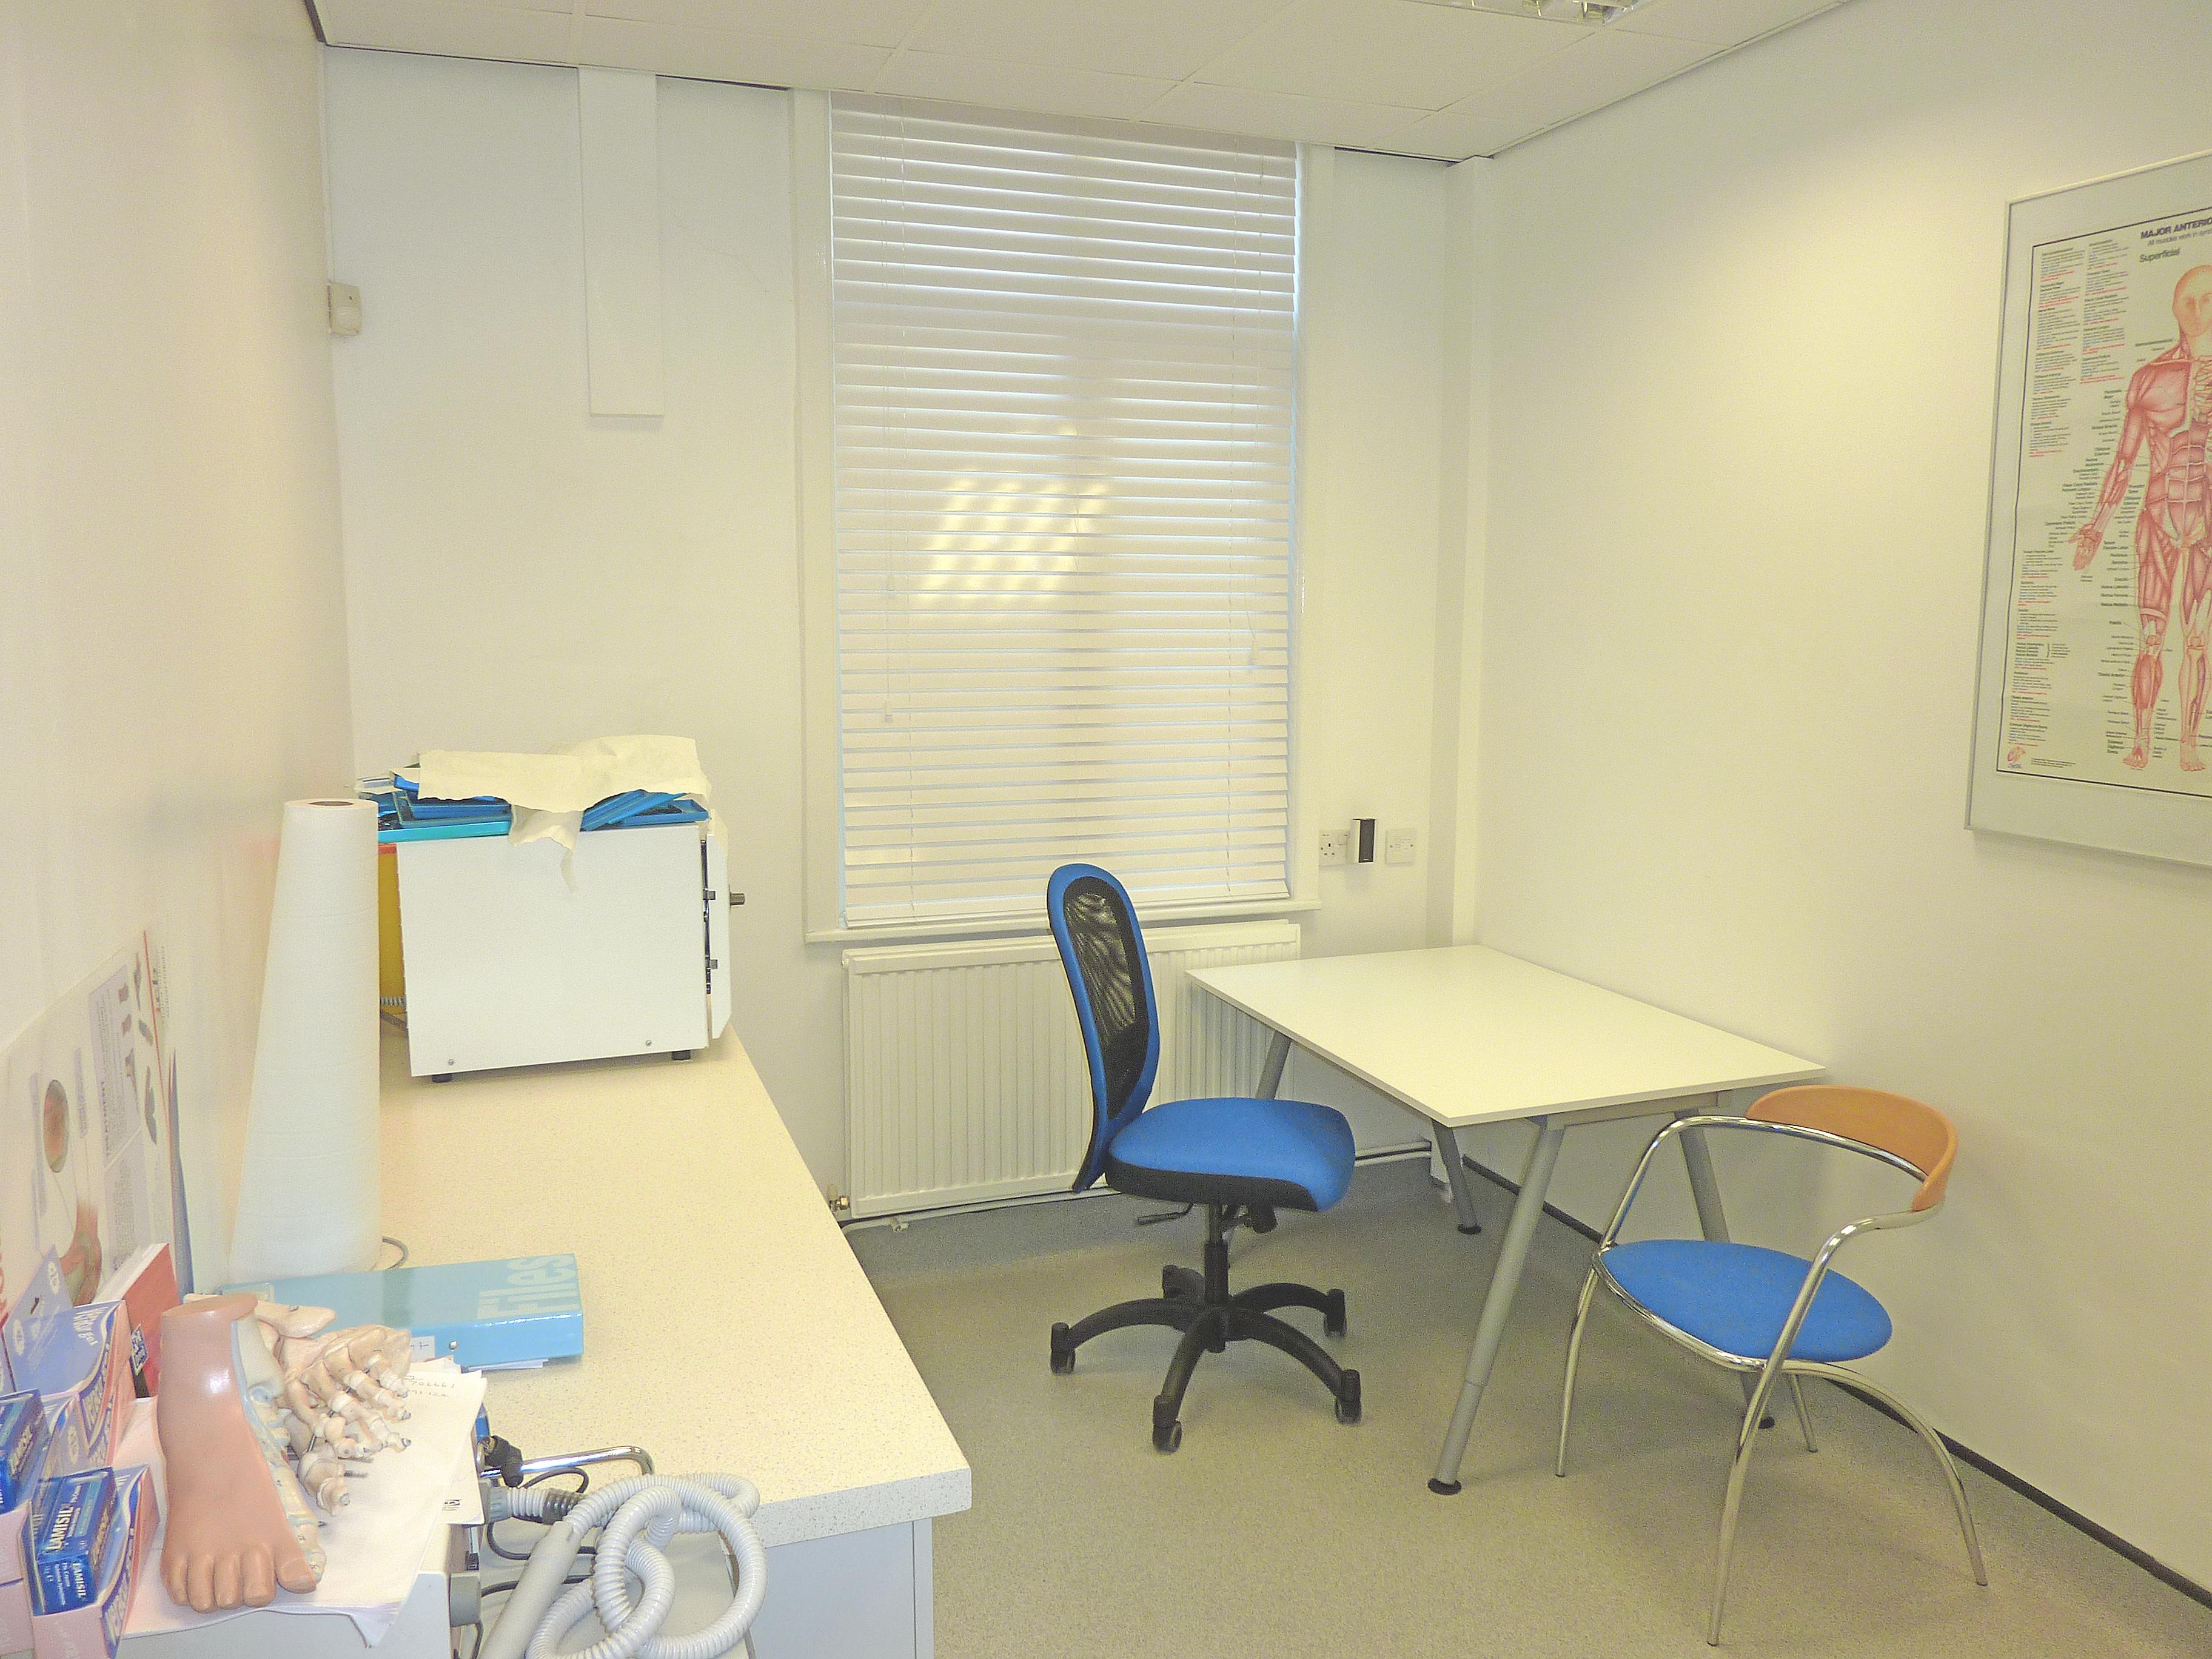 podiatry room rental